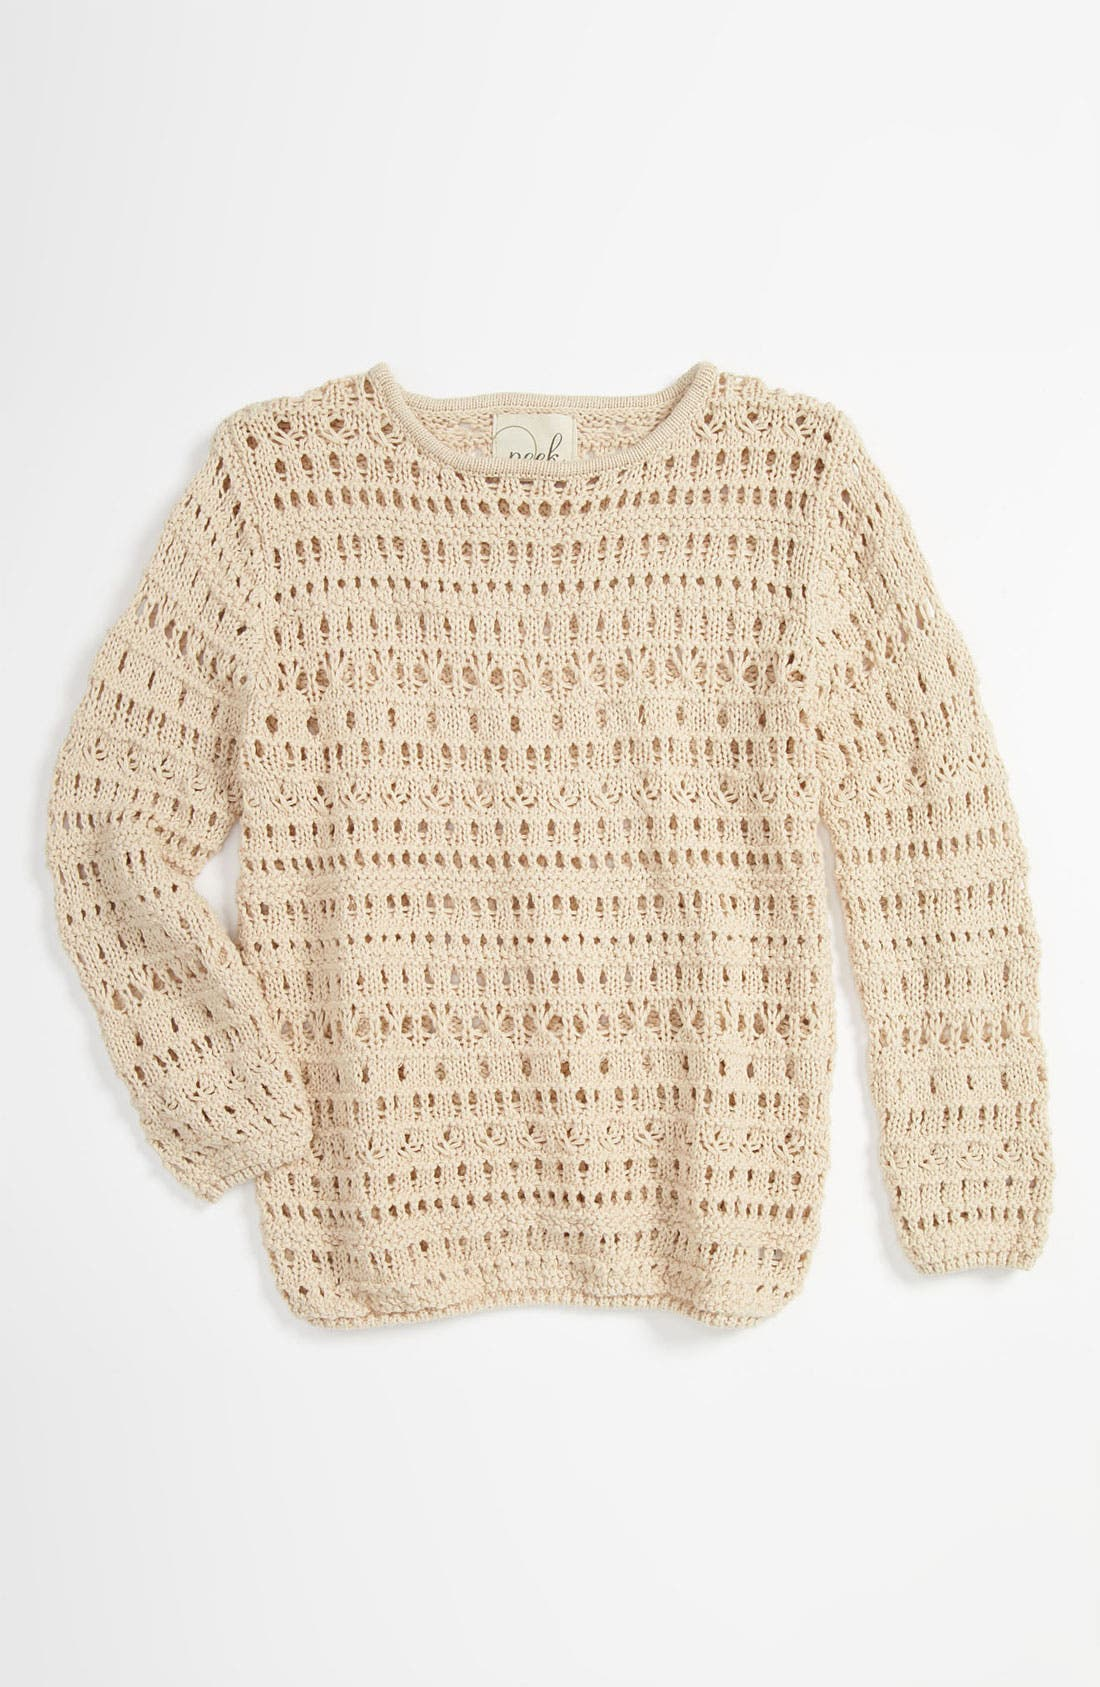 Alternate Image 1 Selected - Peek 'Flax' Sweater (Toddler, Little Girls & Big Girls)